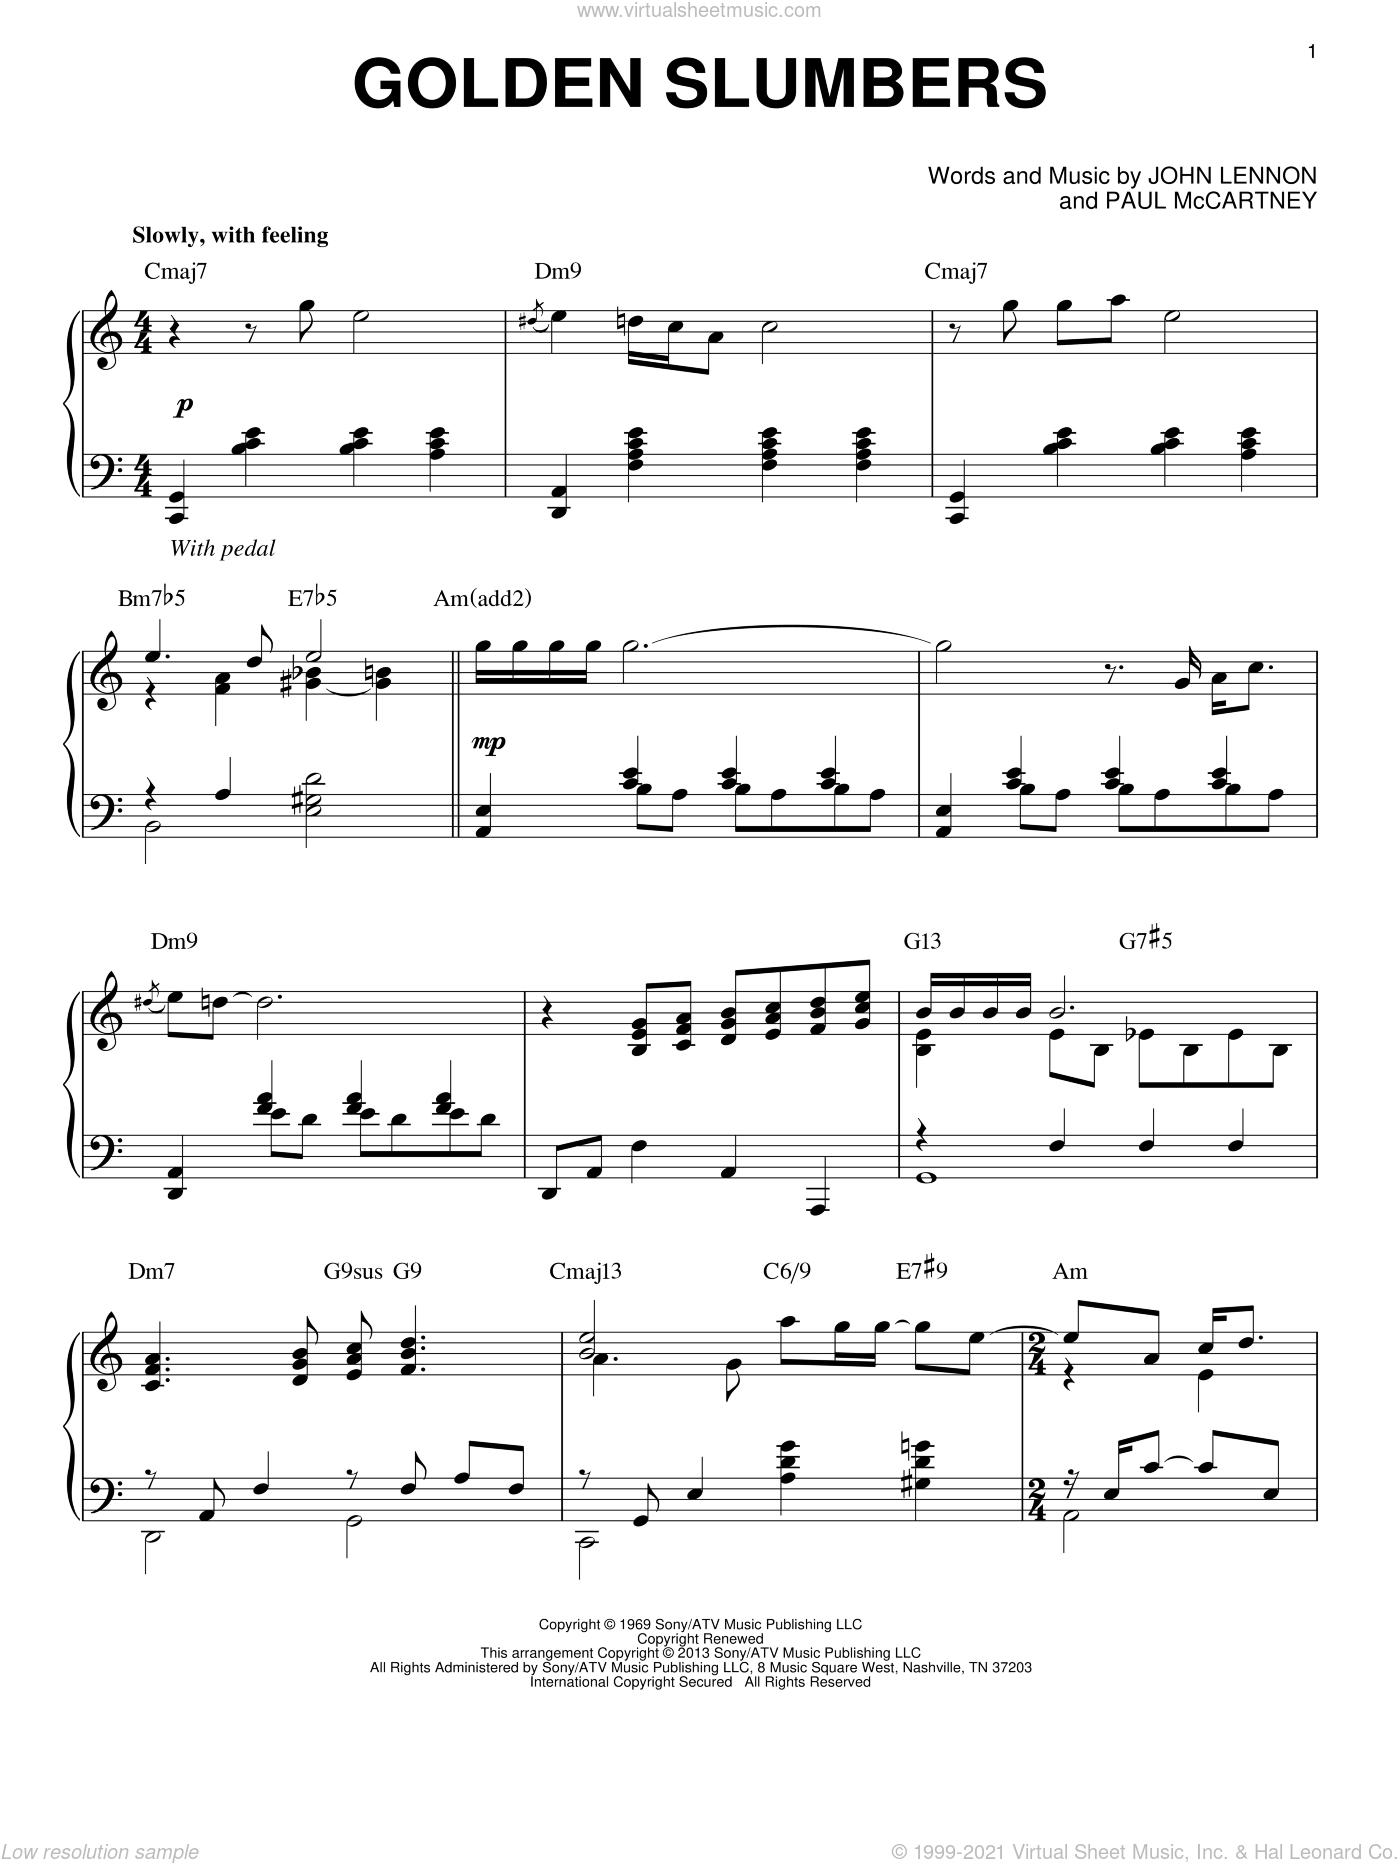 Golden Slumbers [Jazz version] (arr. Brent Edstrom) sheet music for piano solo by The Beatles, John Lennon and Paul McCartney, intermediate skill level